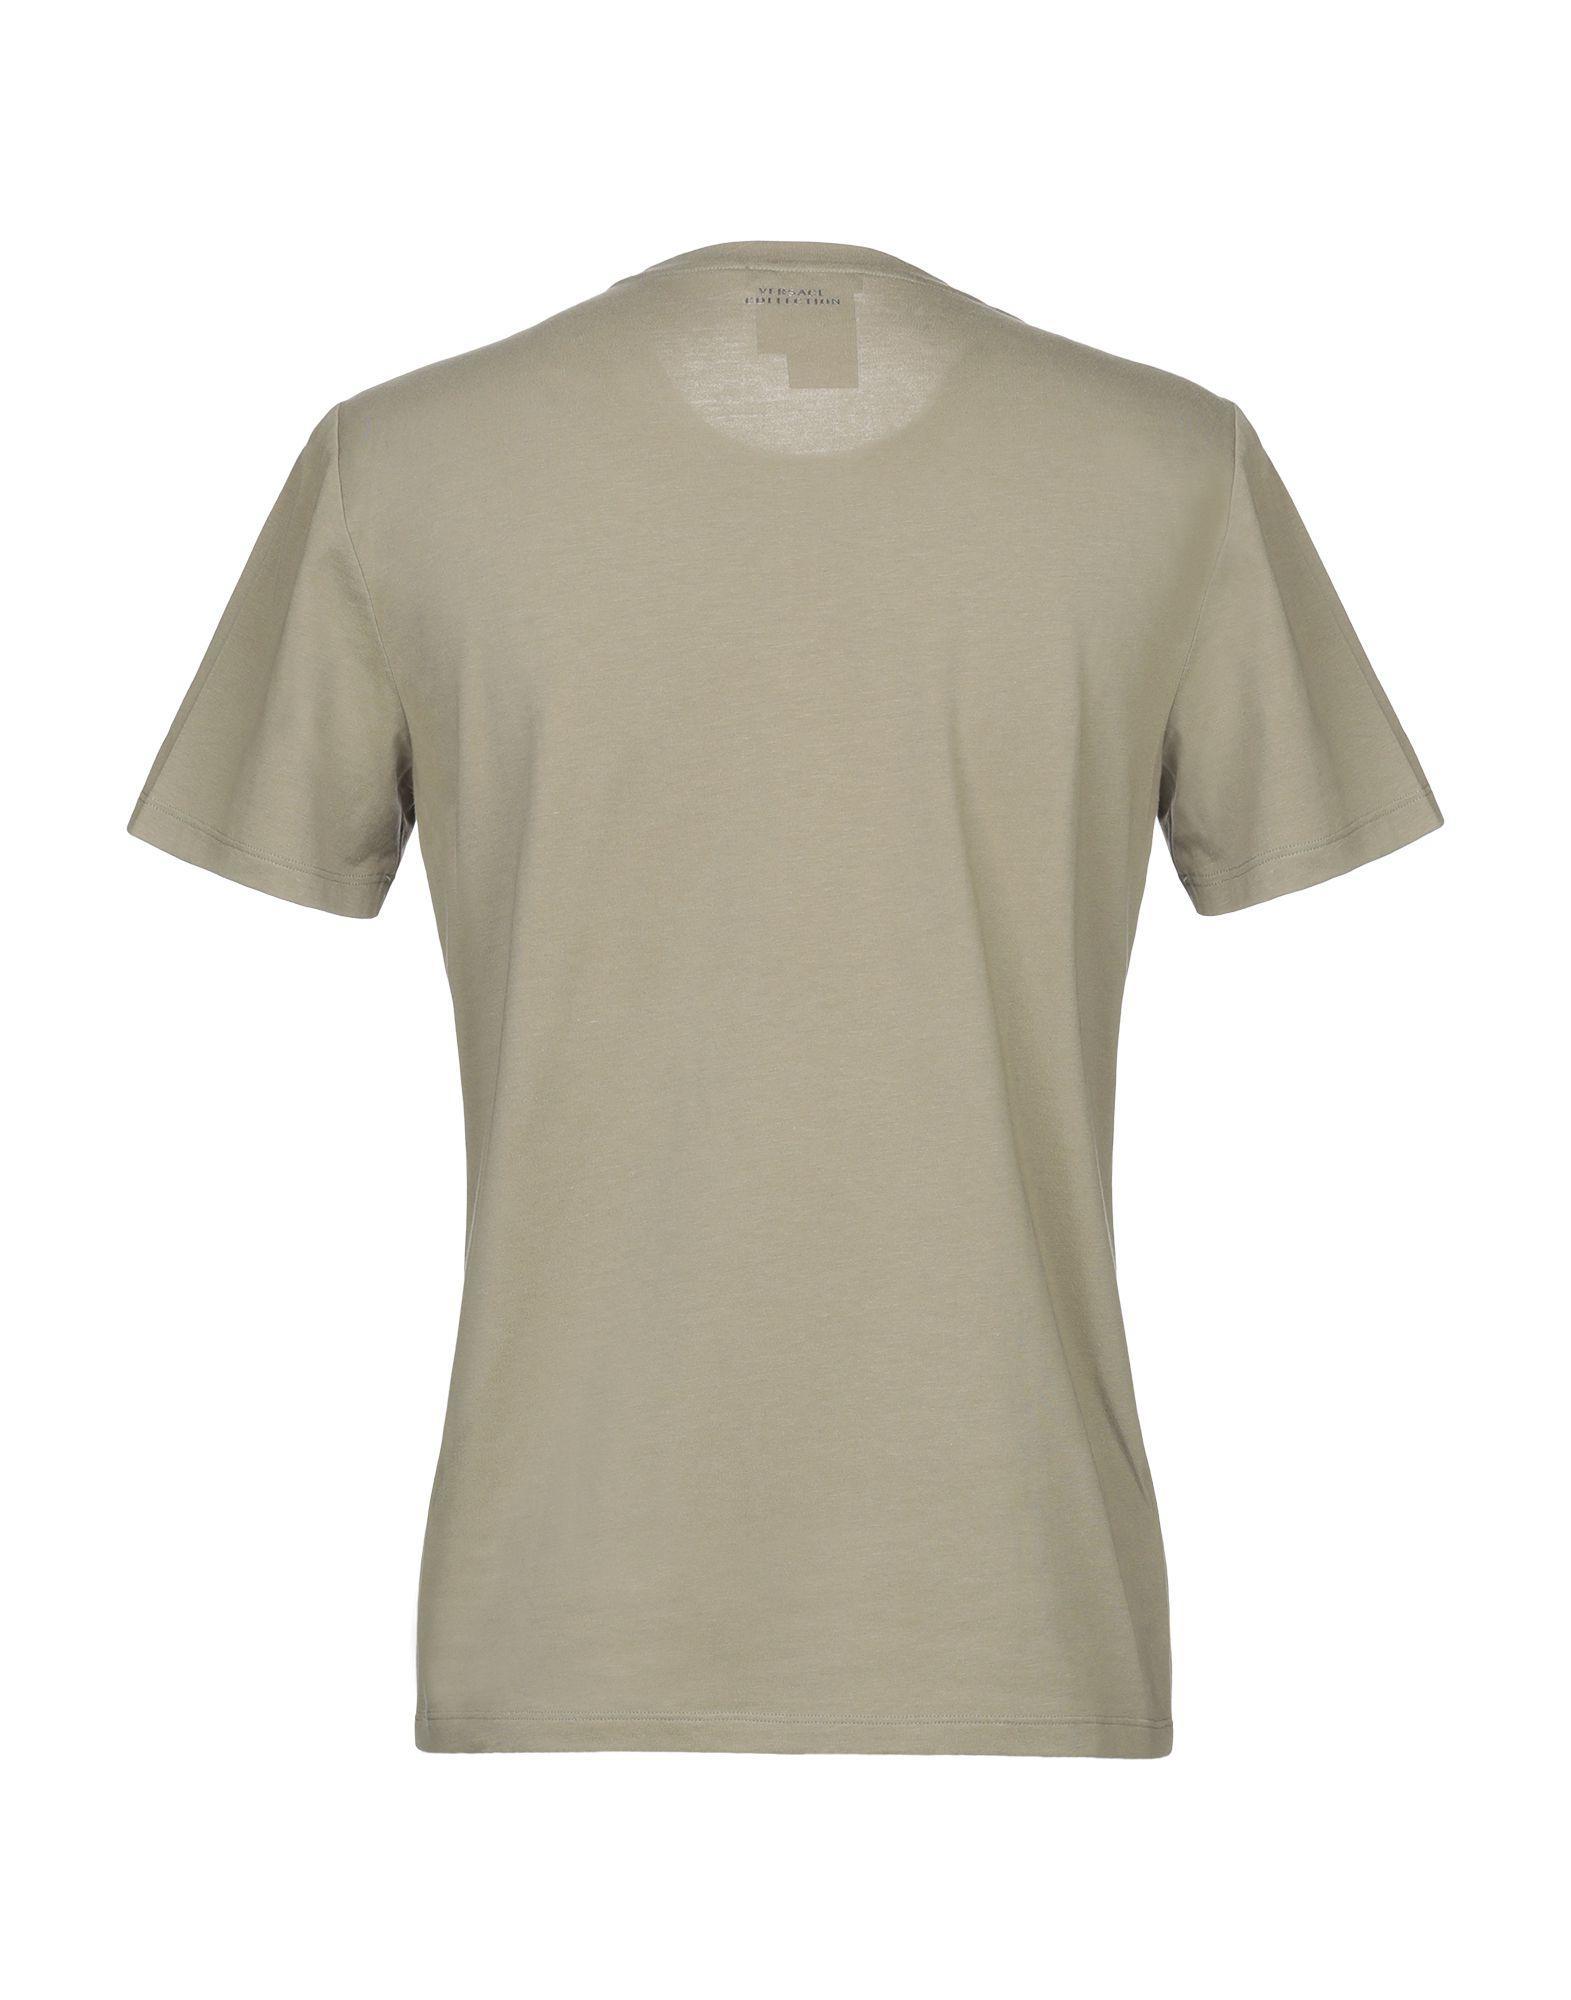 956625a9 Versace T-shirt in Green for Men - Lyst